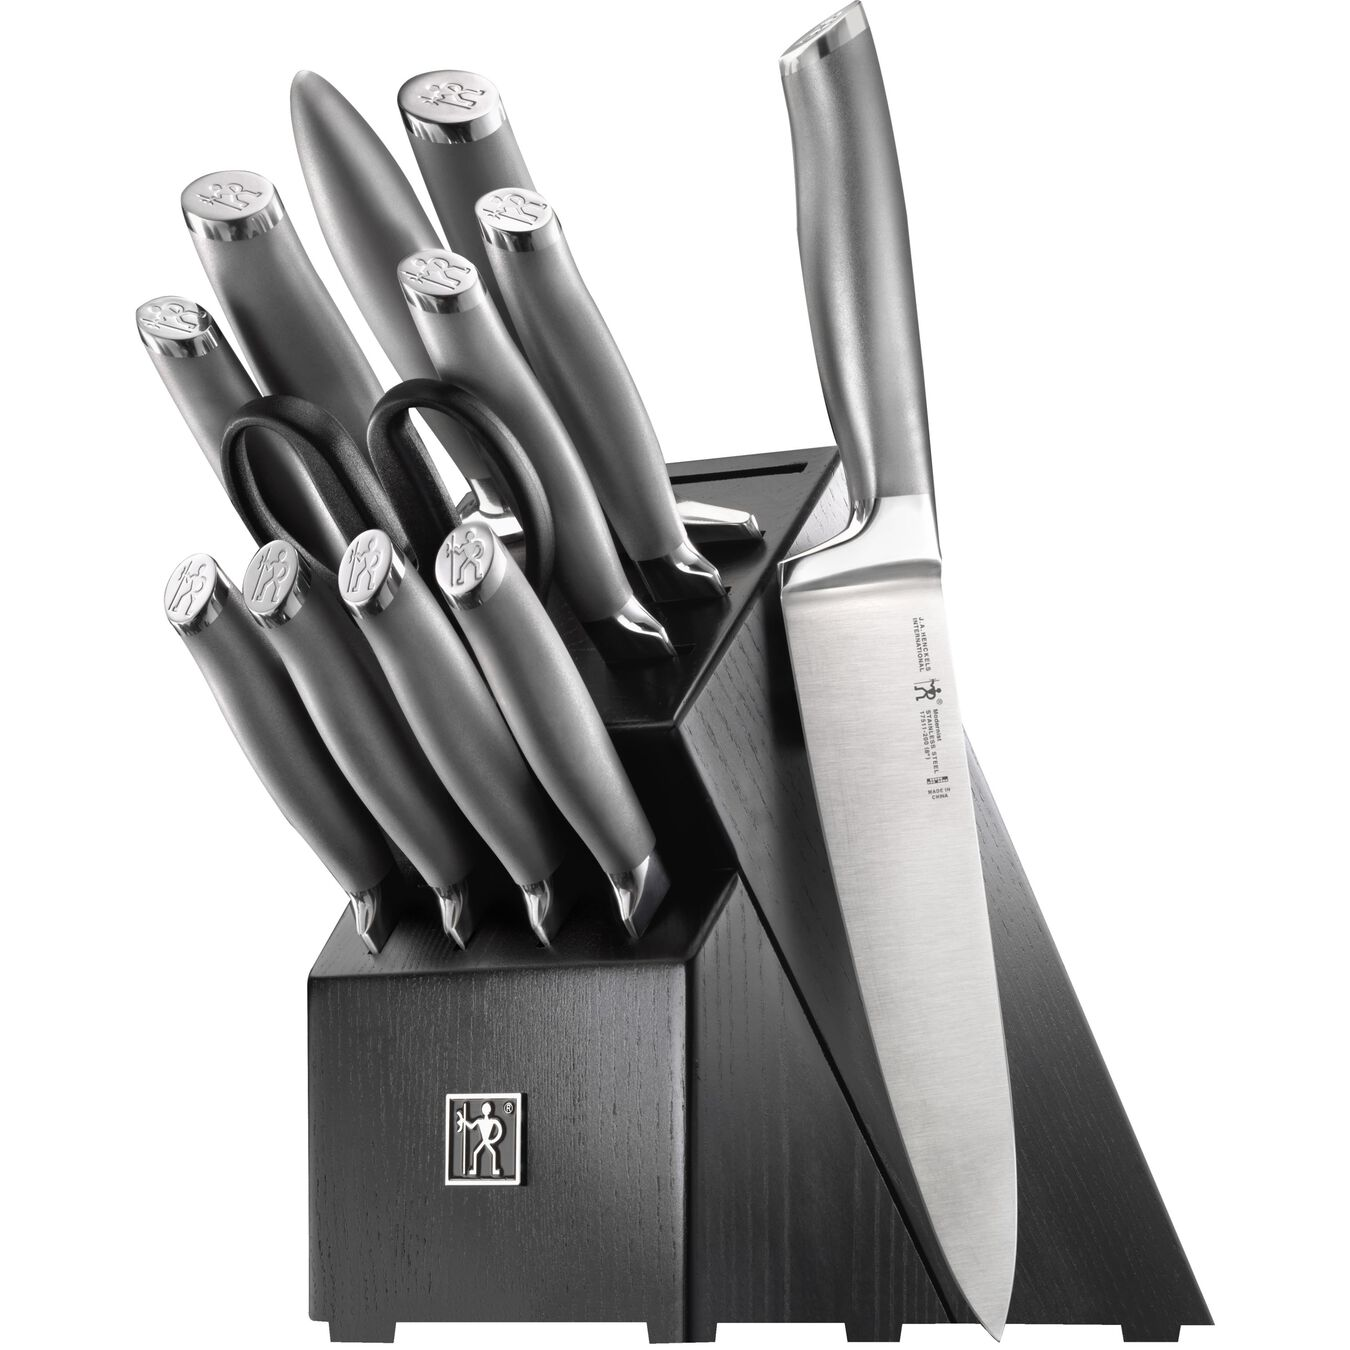 13-pc Knife Block Set,,large 1